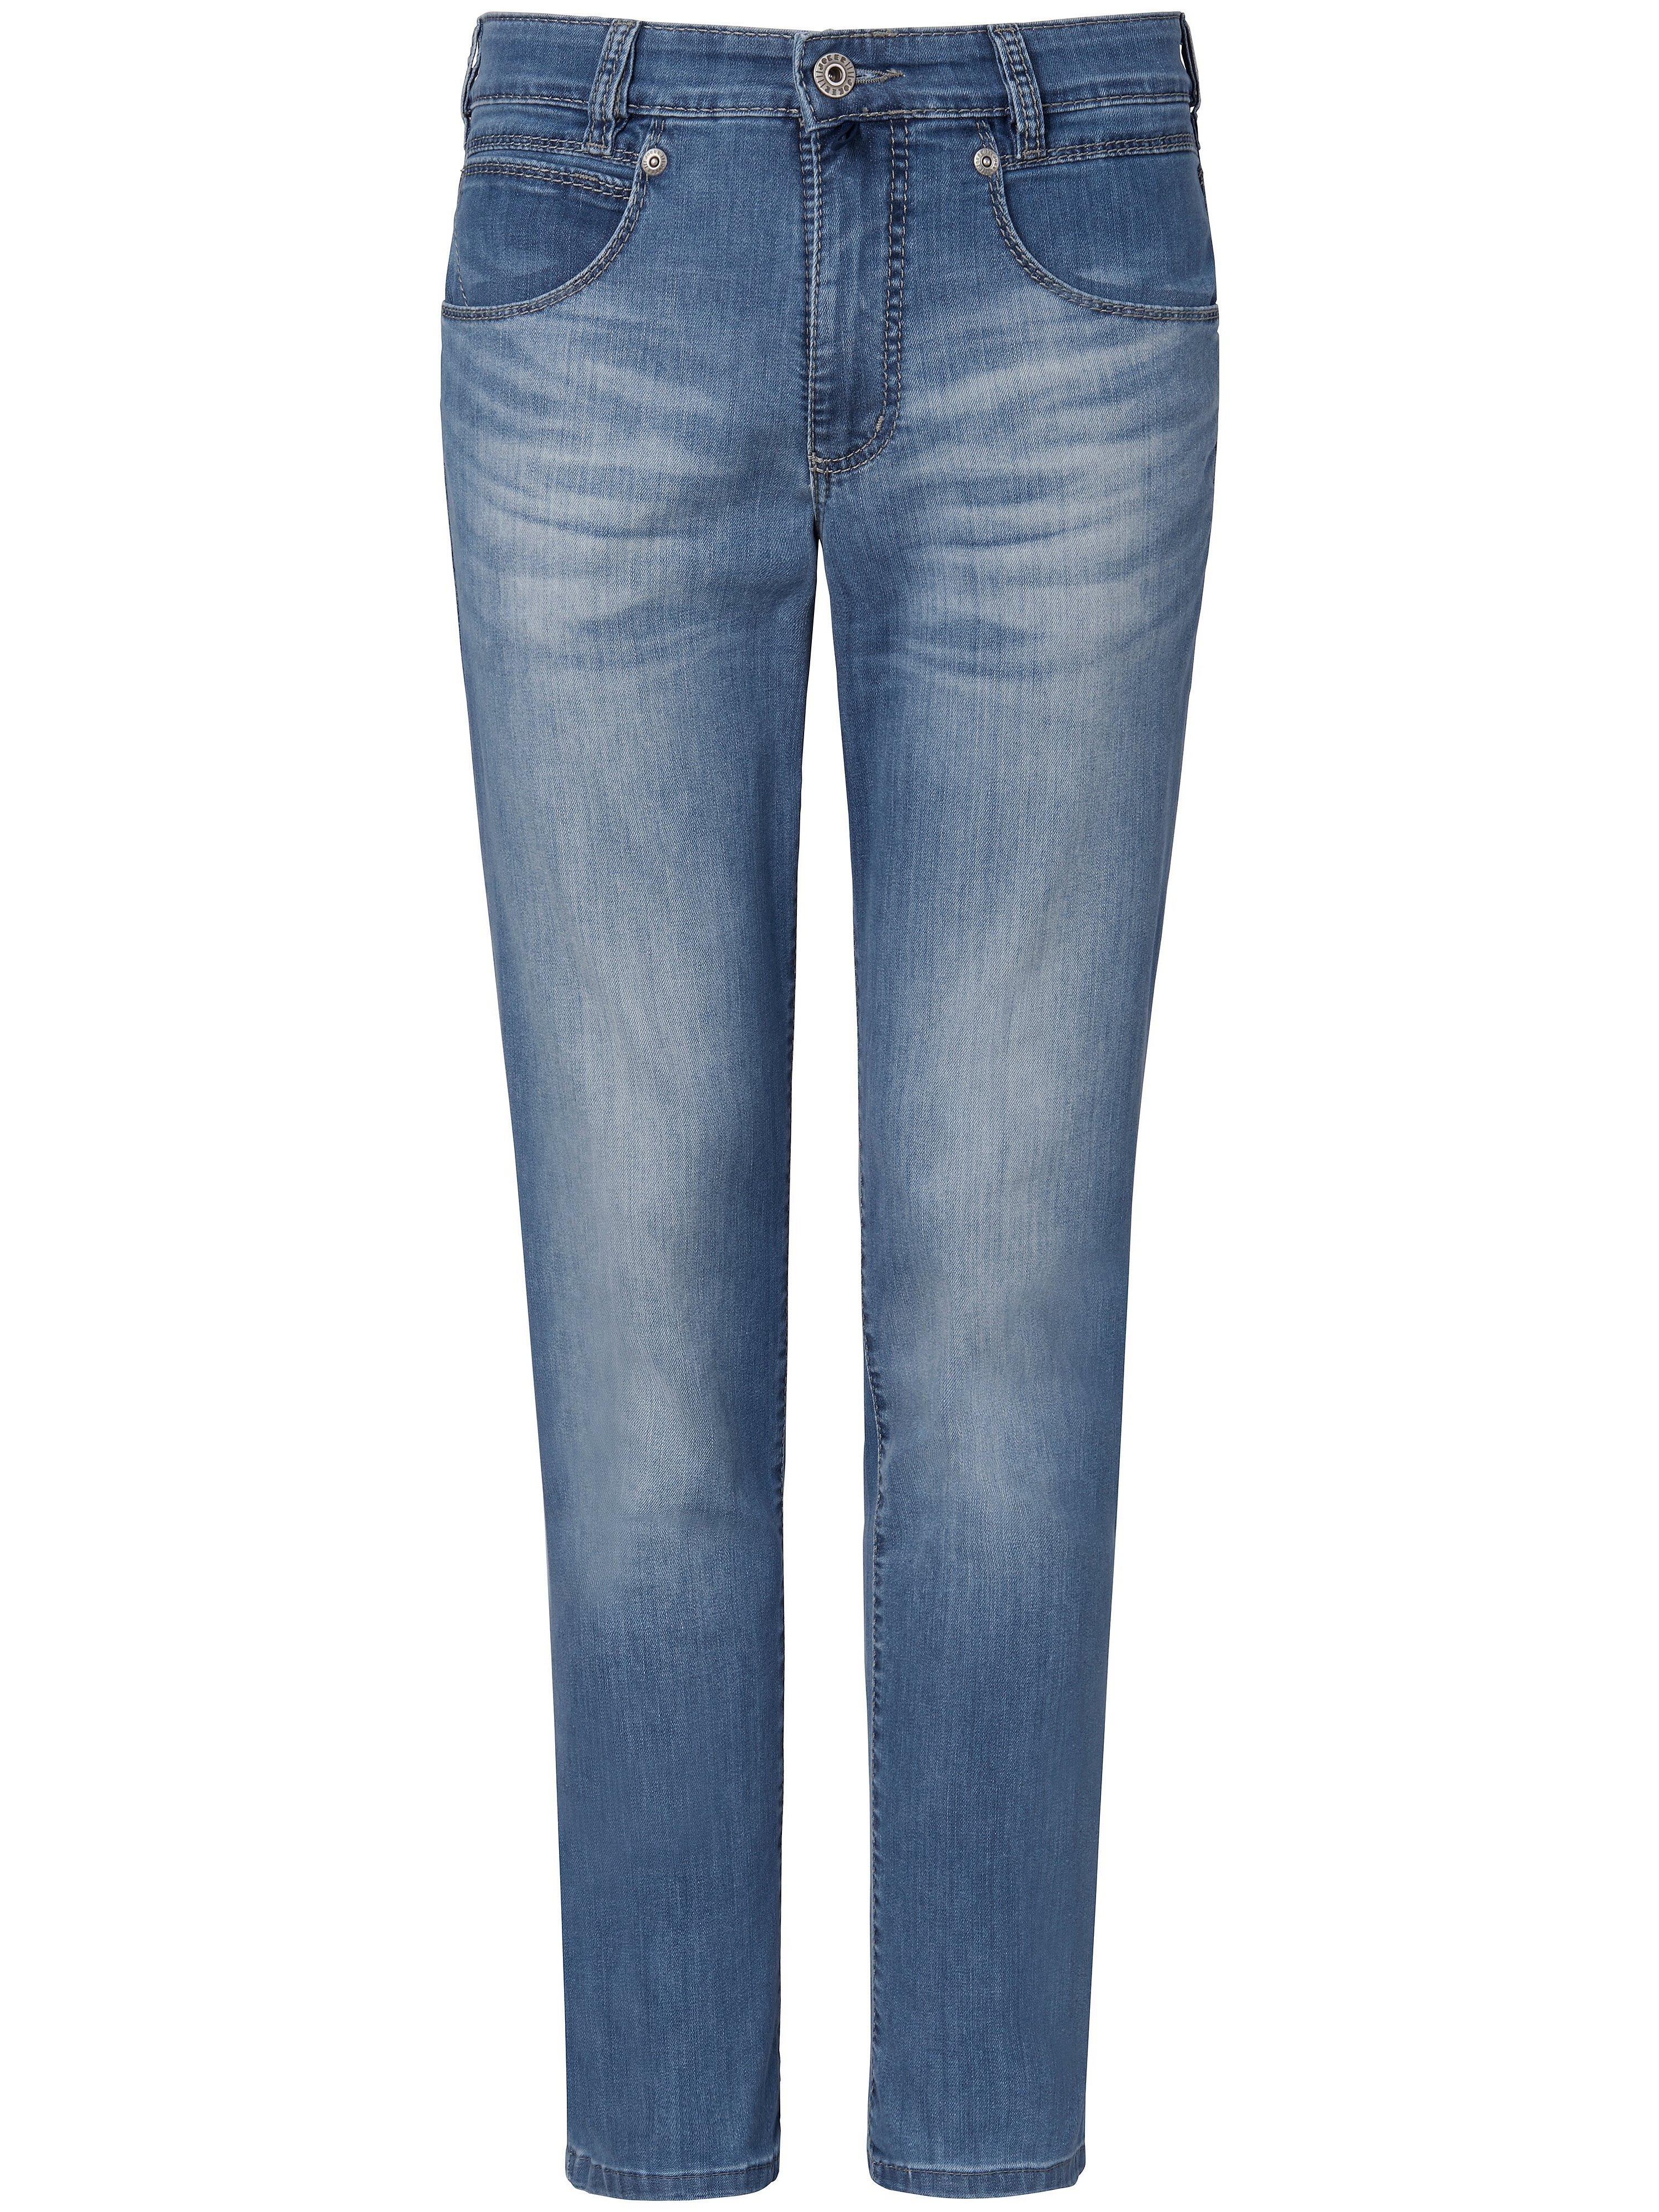 Comforable Fit-jeans model Freddy Van JOKER denim